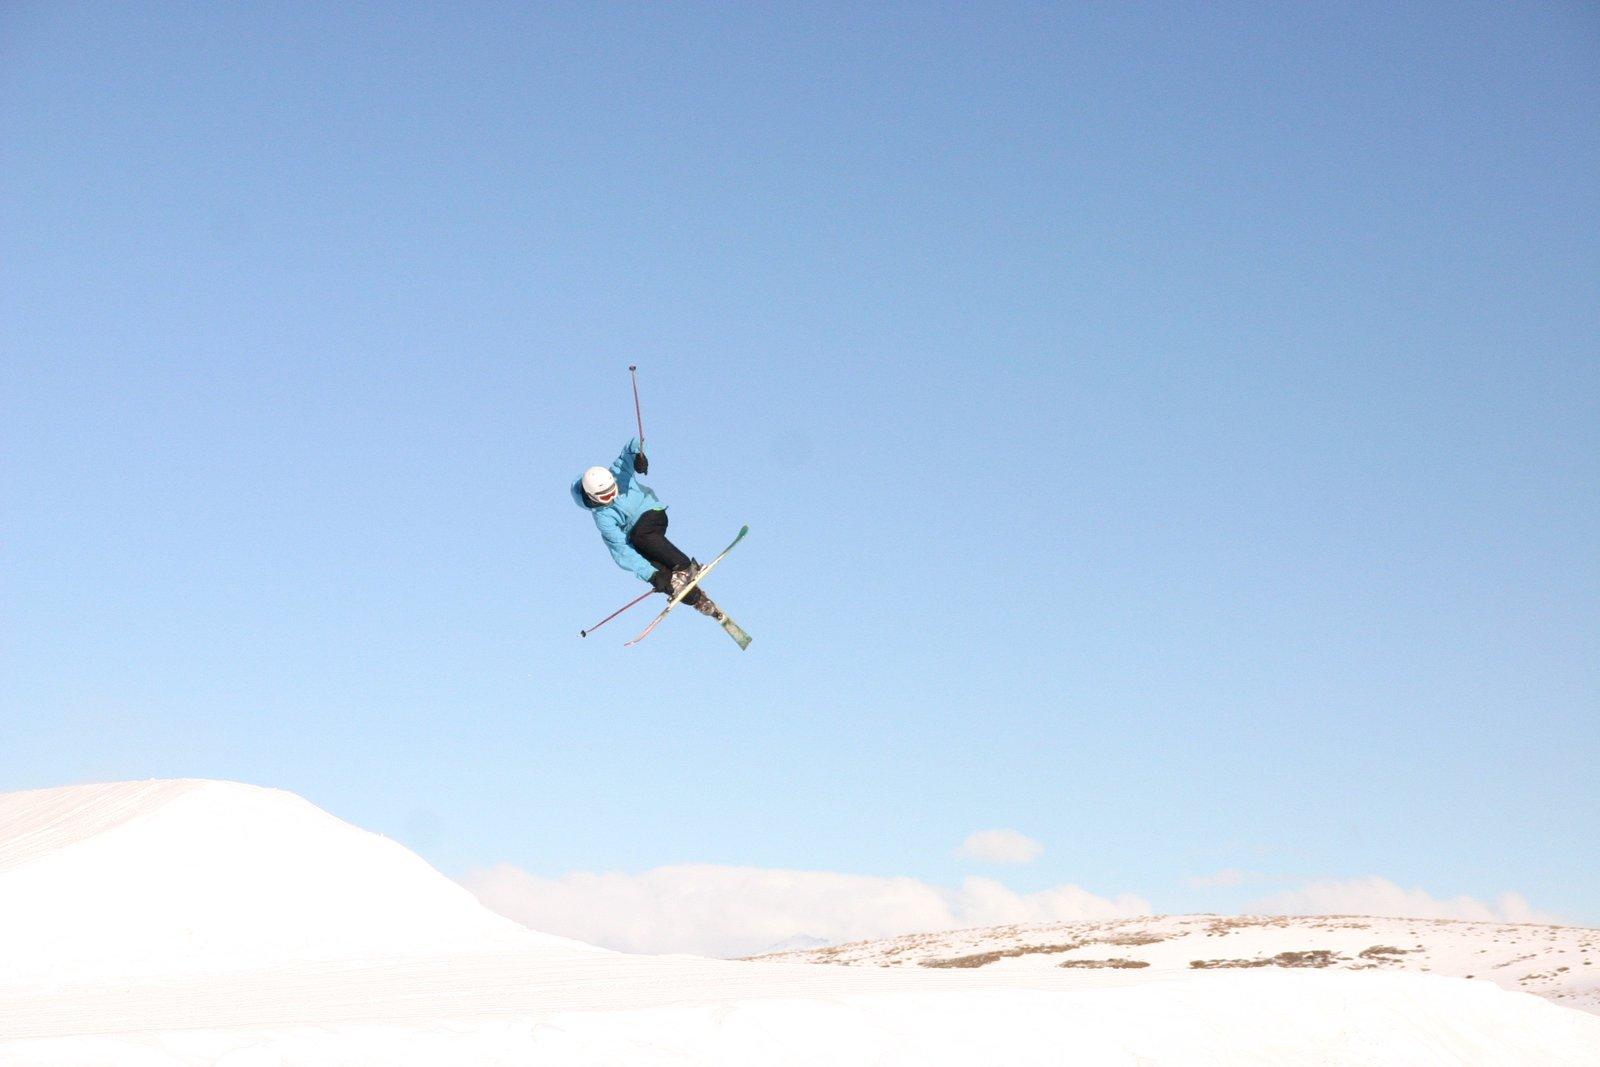 Snowpark 540 [2]